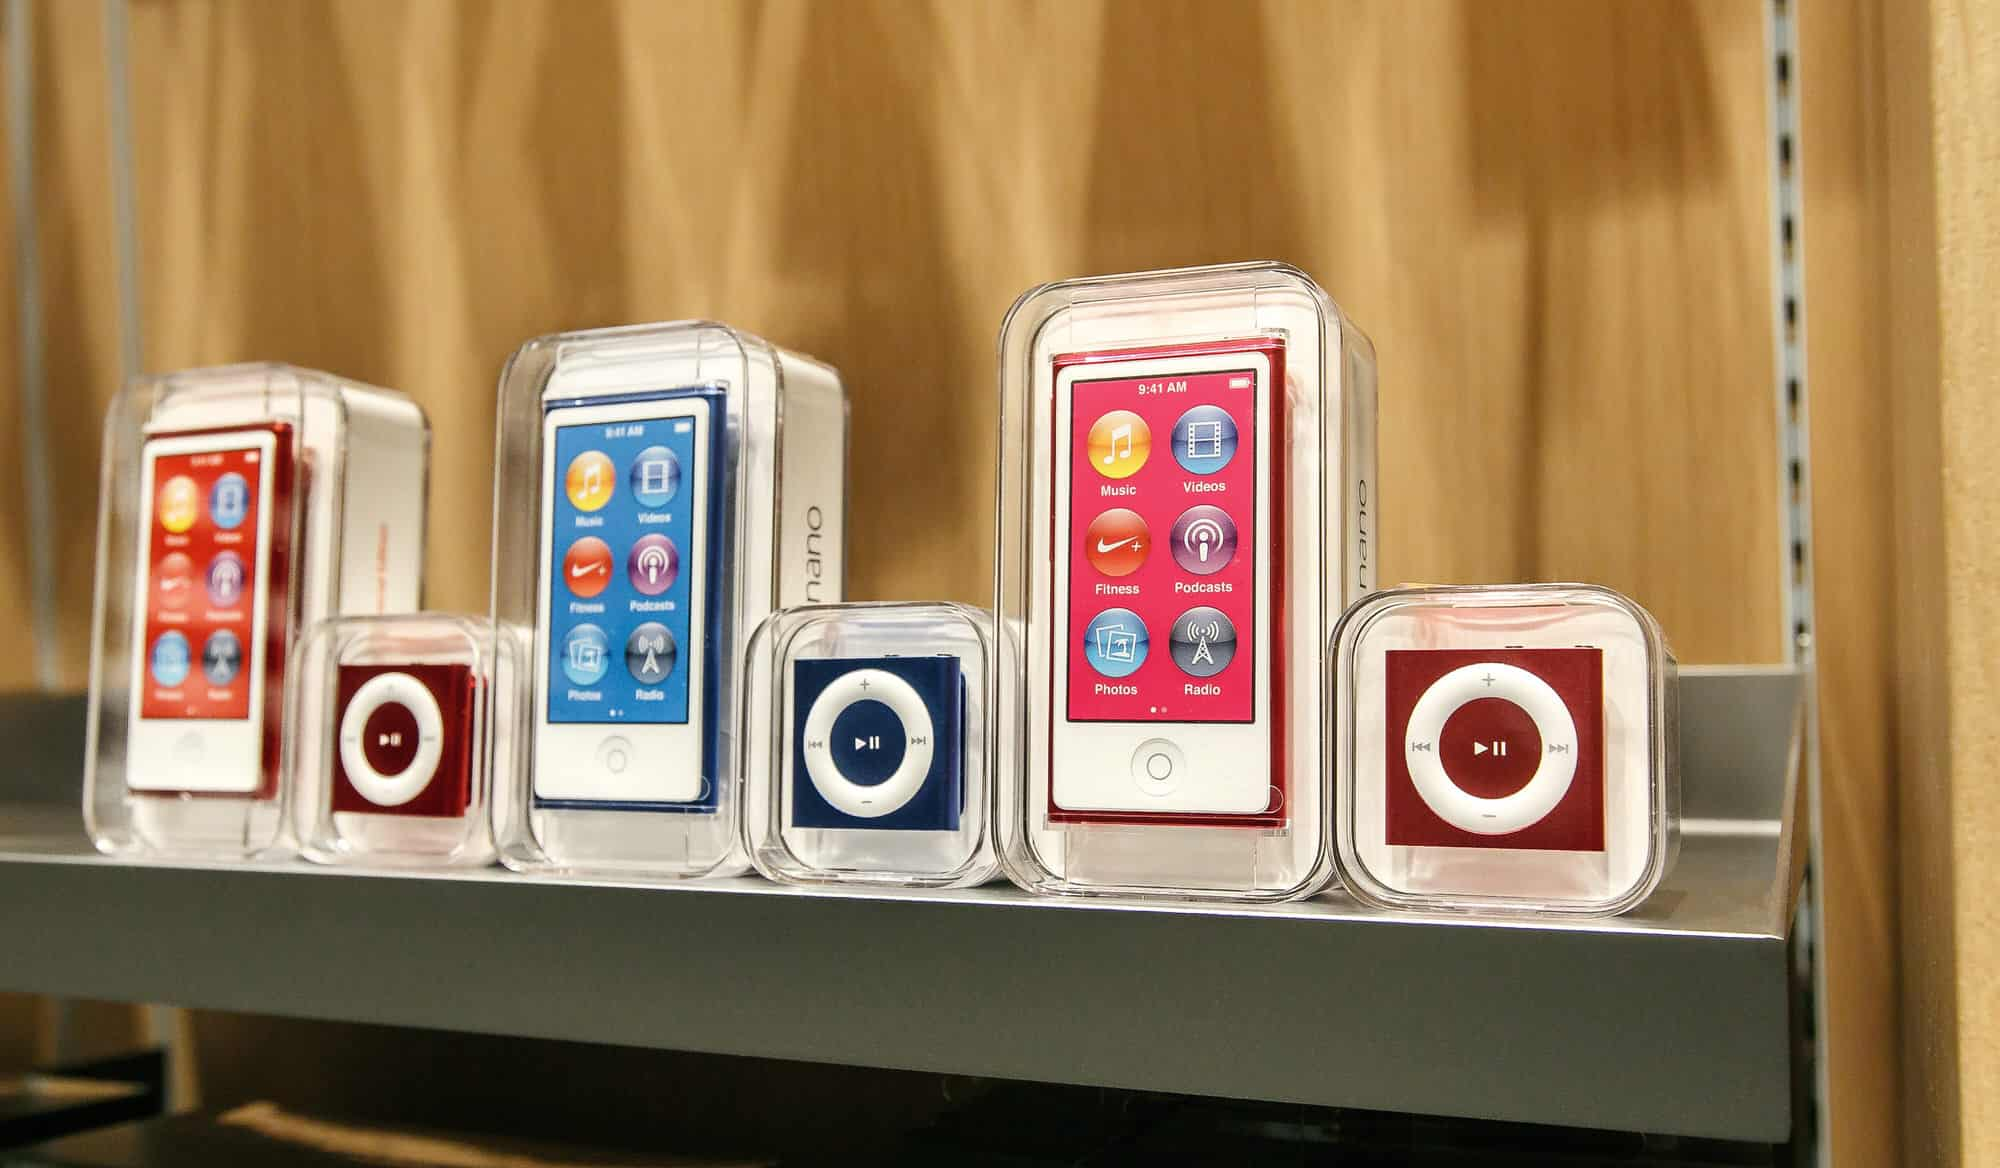 iPod-Ladegeräte